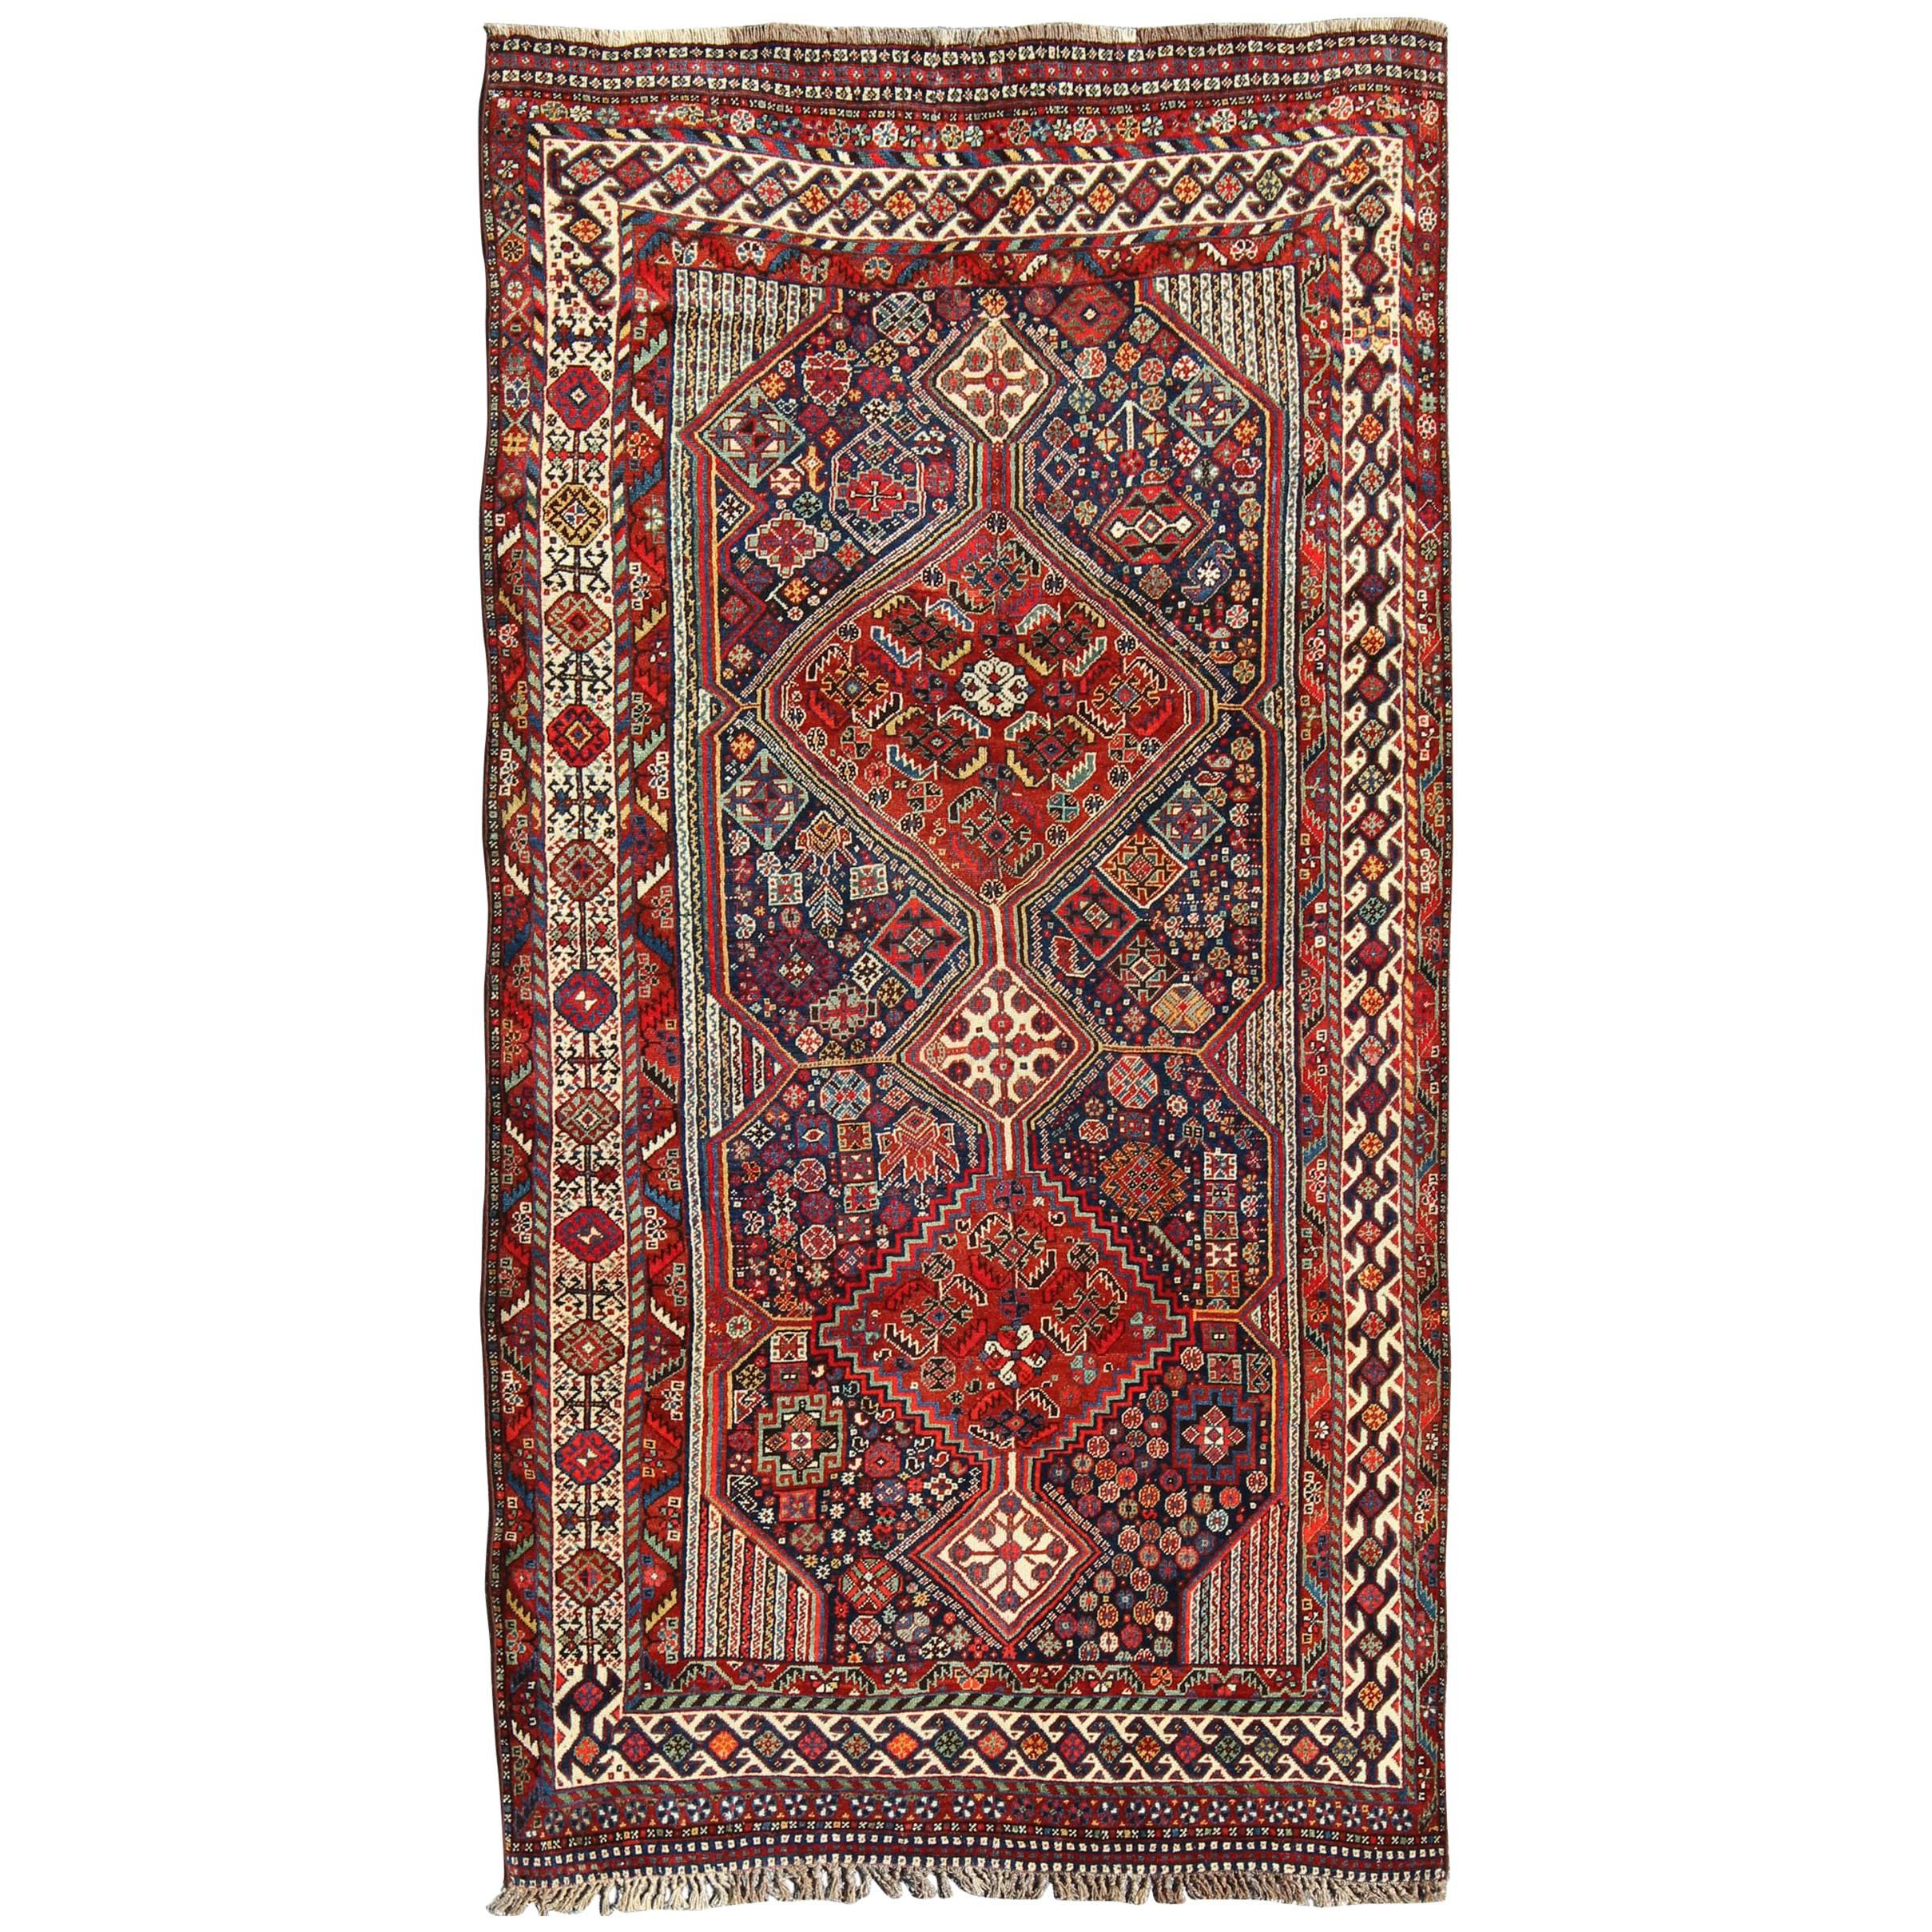 Antique Persian Qashqai Shiraz Tribal Rug with Hooked Diamond Design